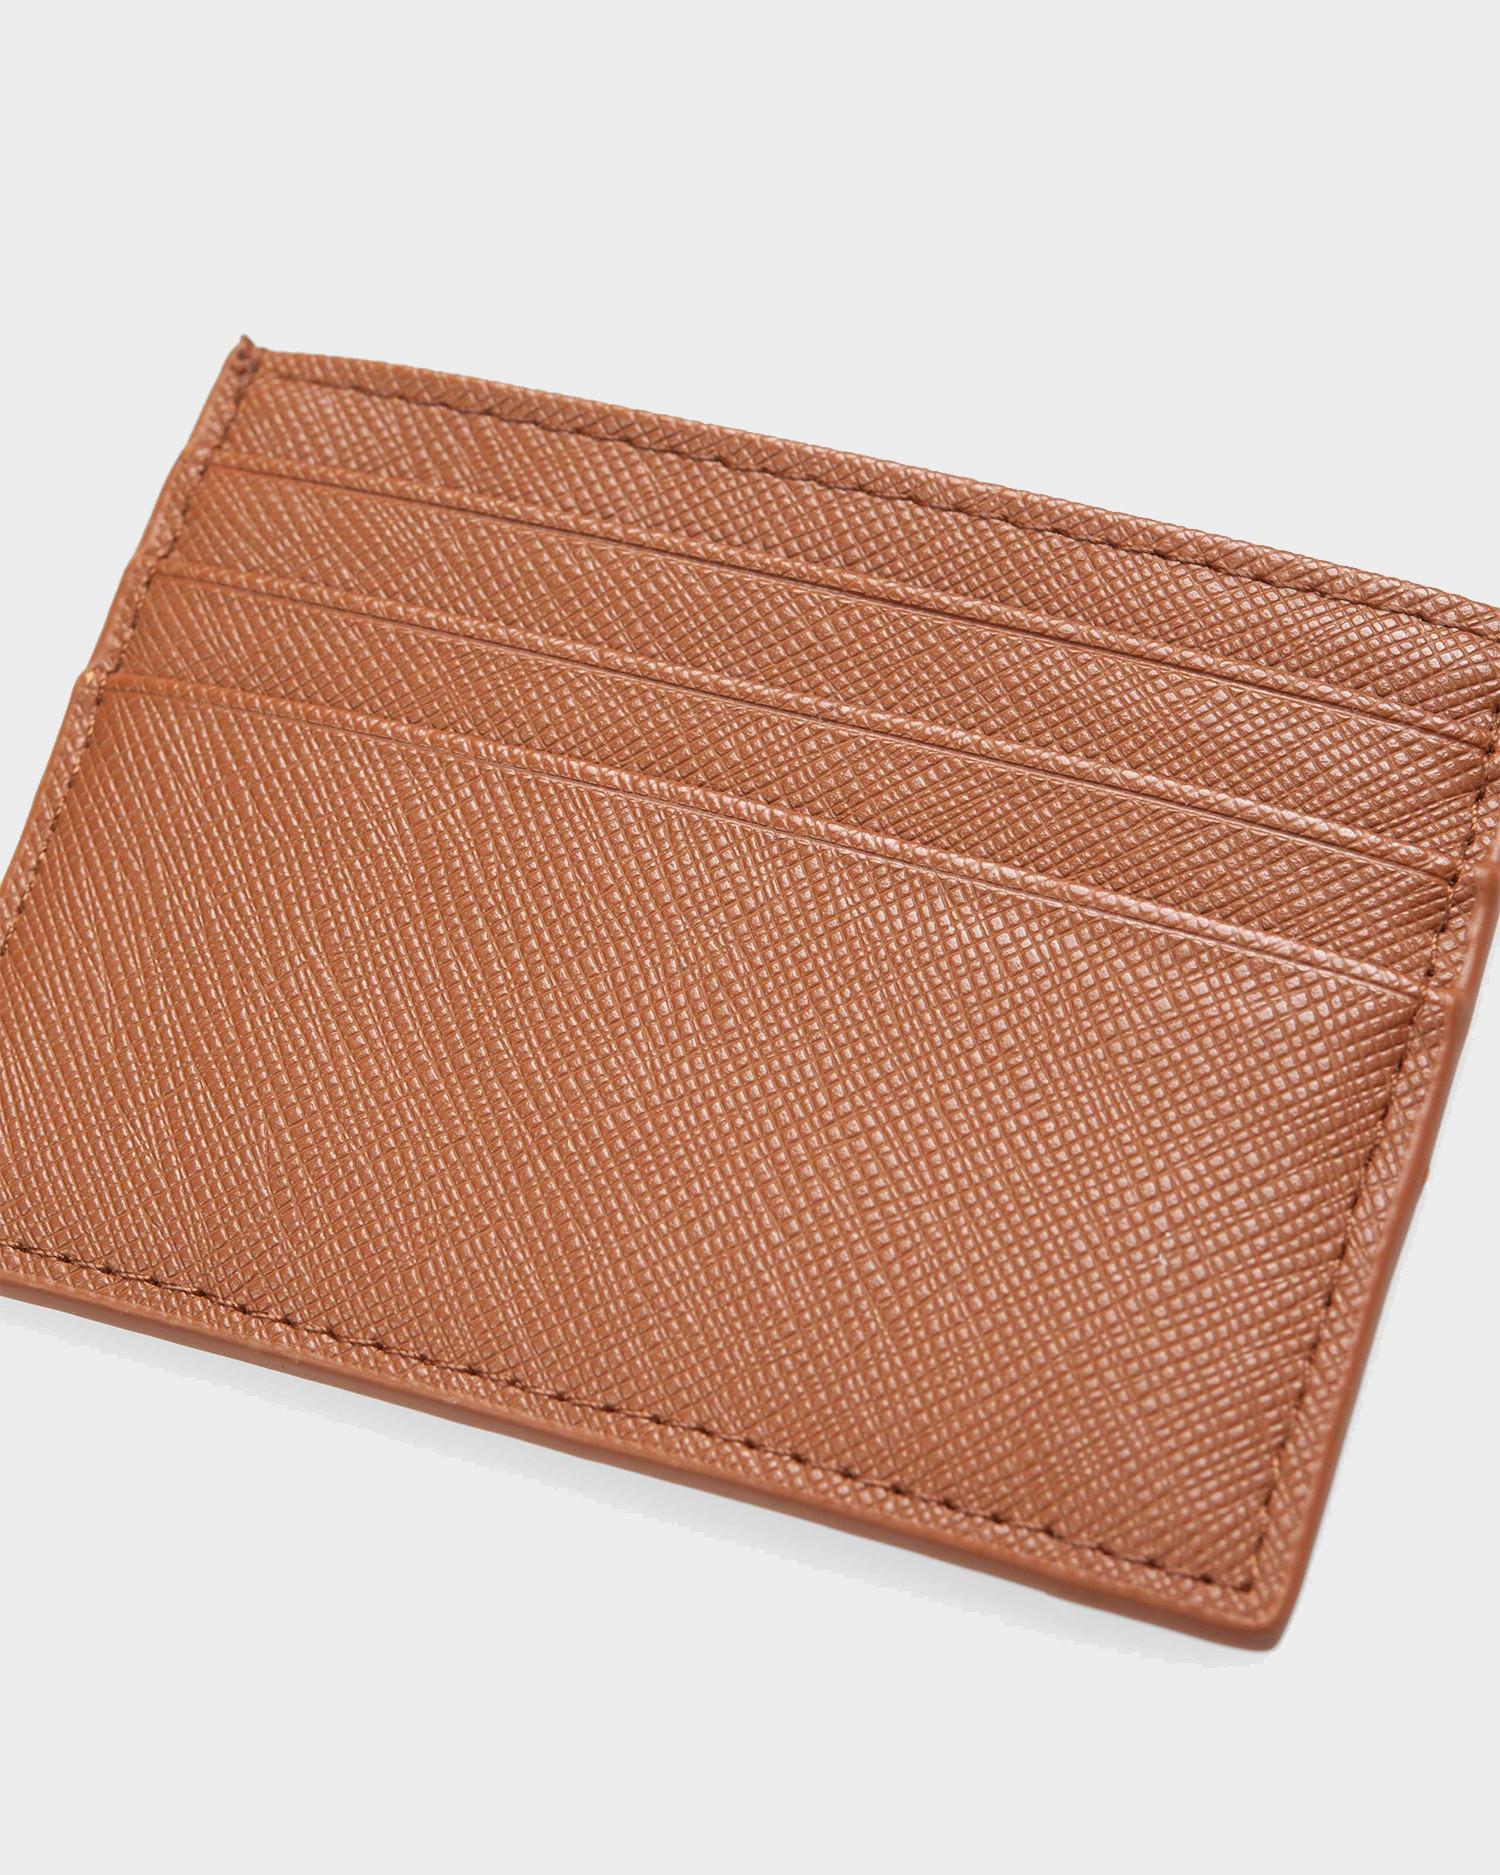 Carhartt Card Holder Coated Hamilton Brown Black